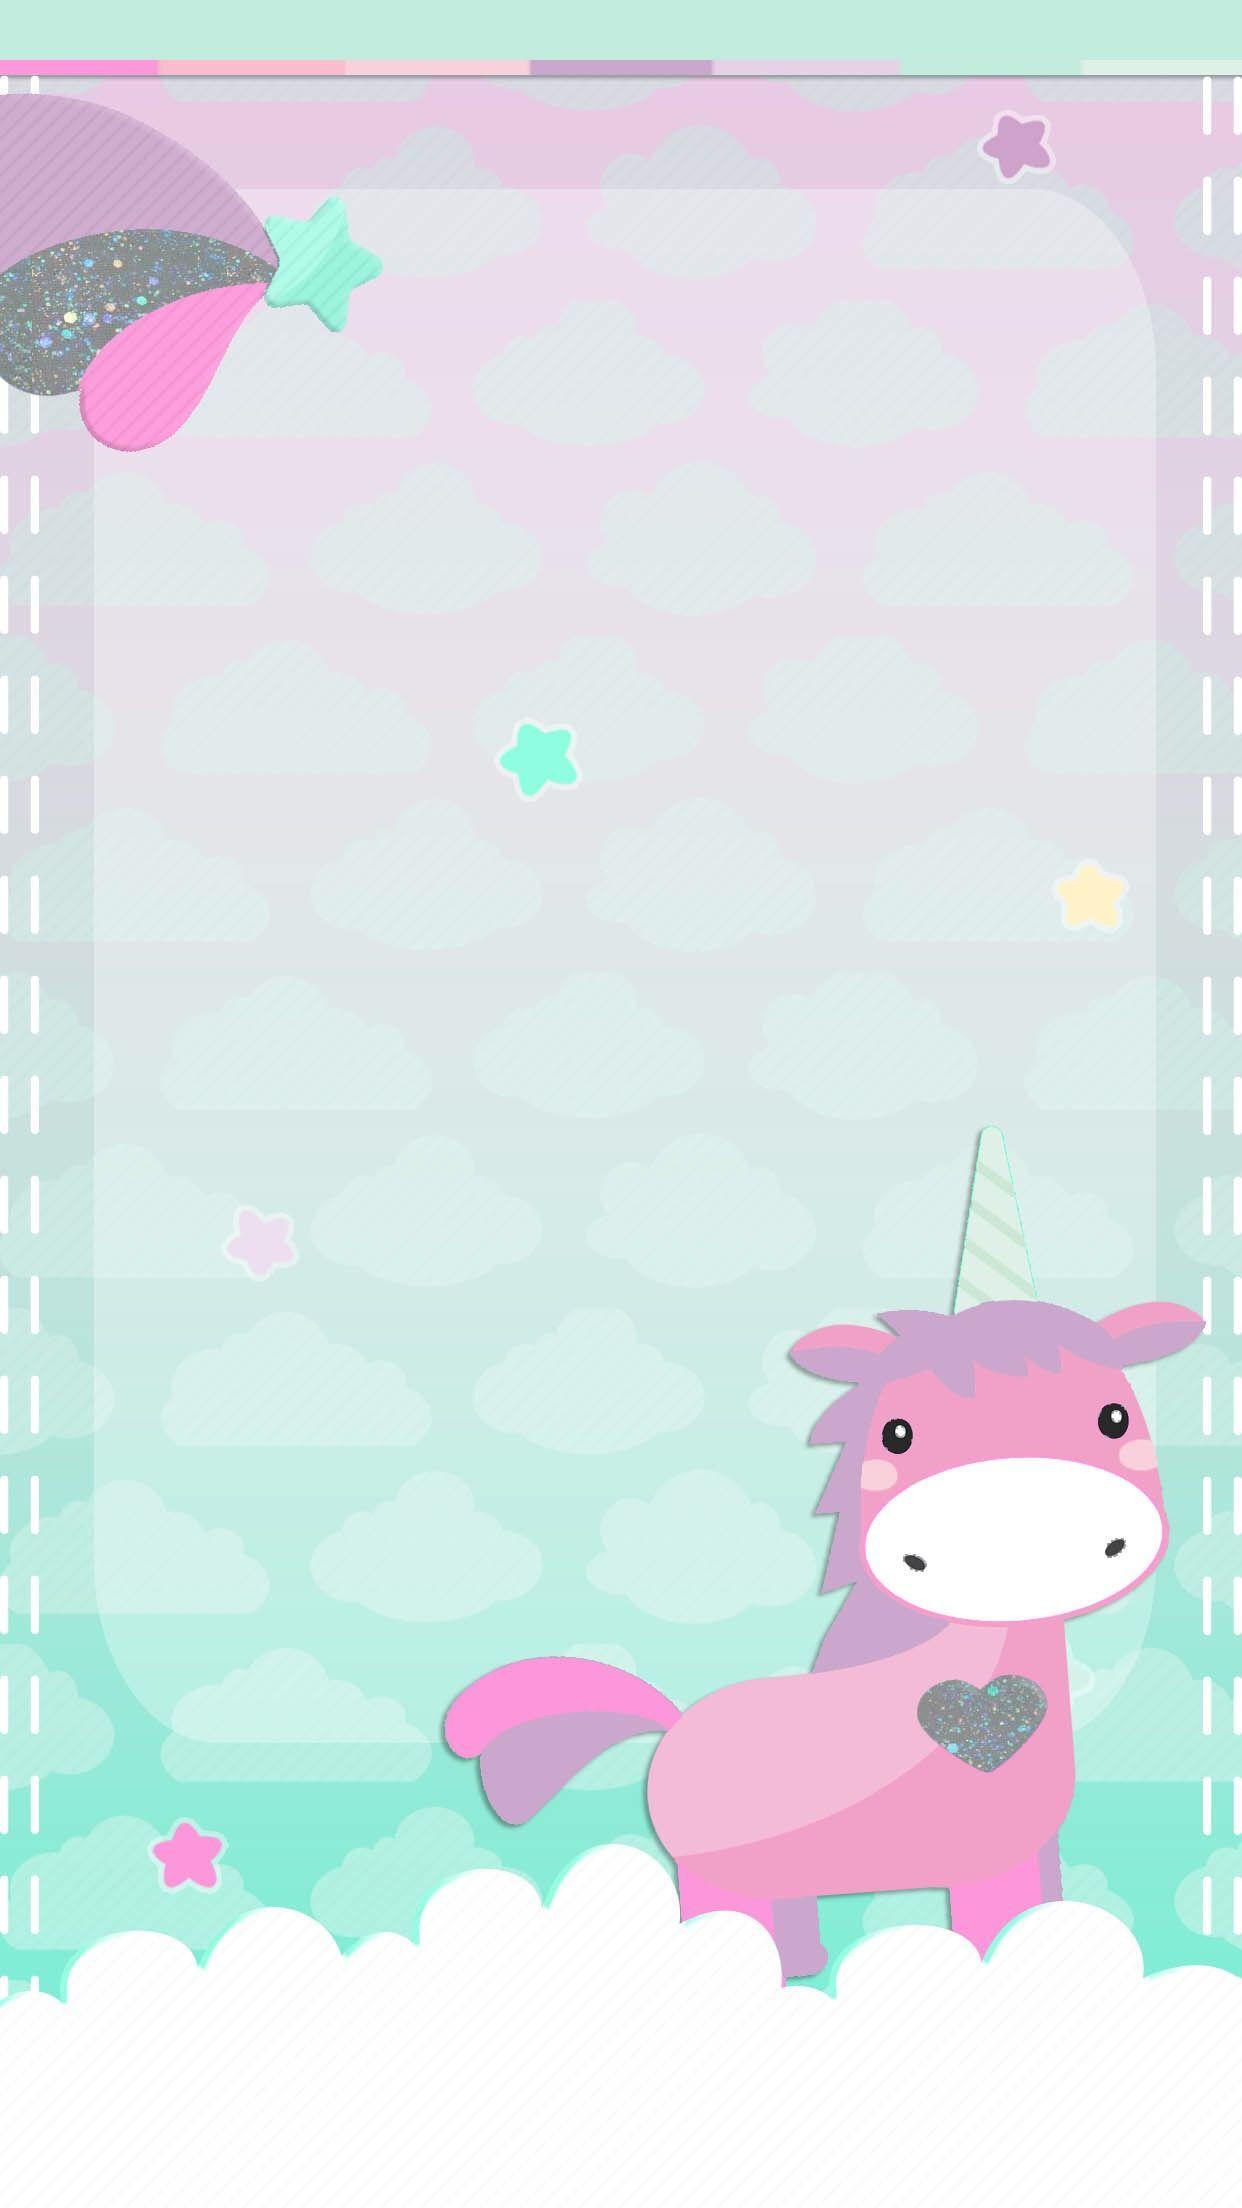 cute unicorn wallpaper licorne pinterest licorne fond d 39 cran mobile et fond ecran. Black Bedroom Furniture Sets. Home Design Ideas